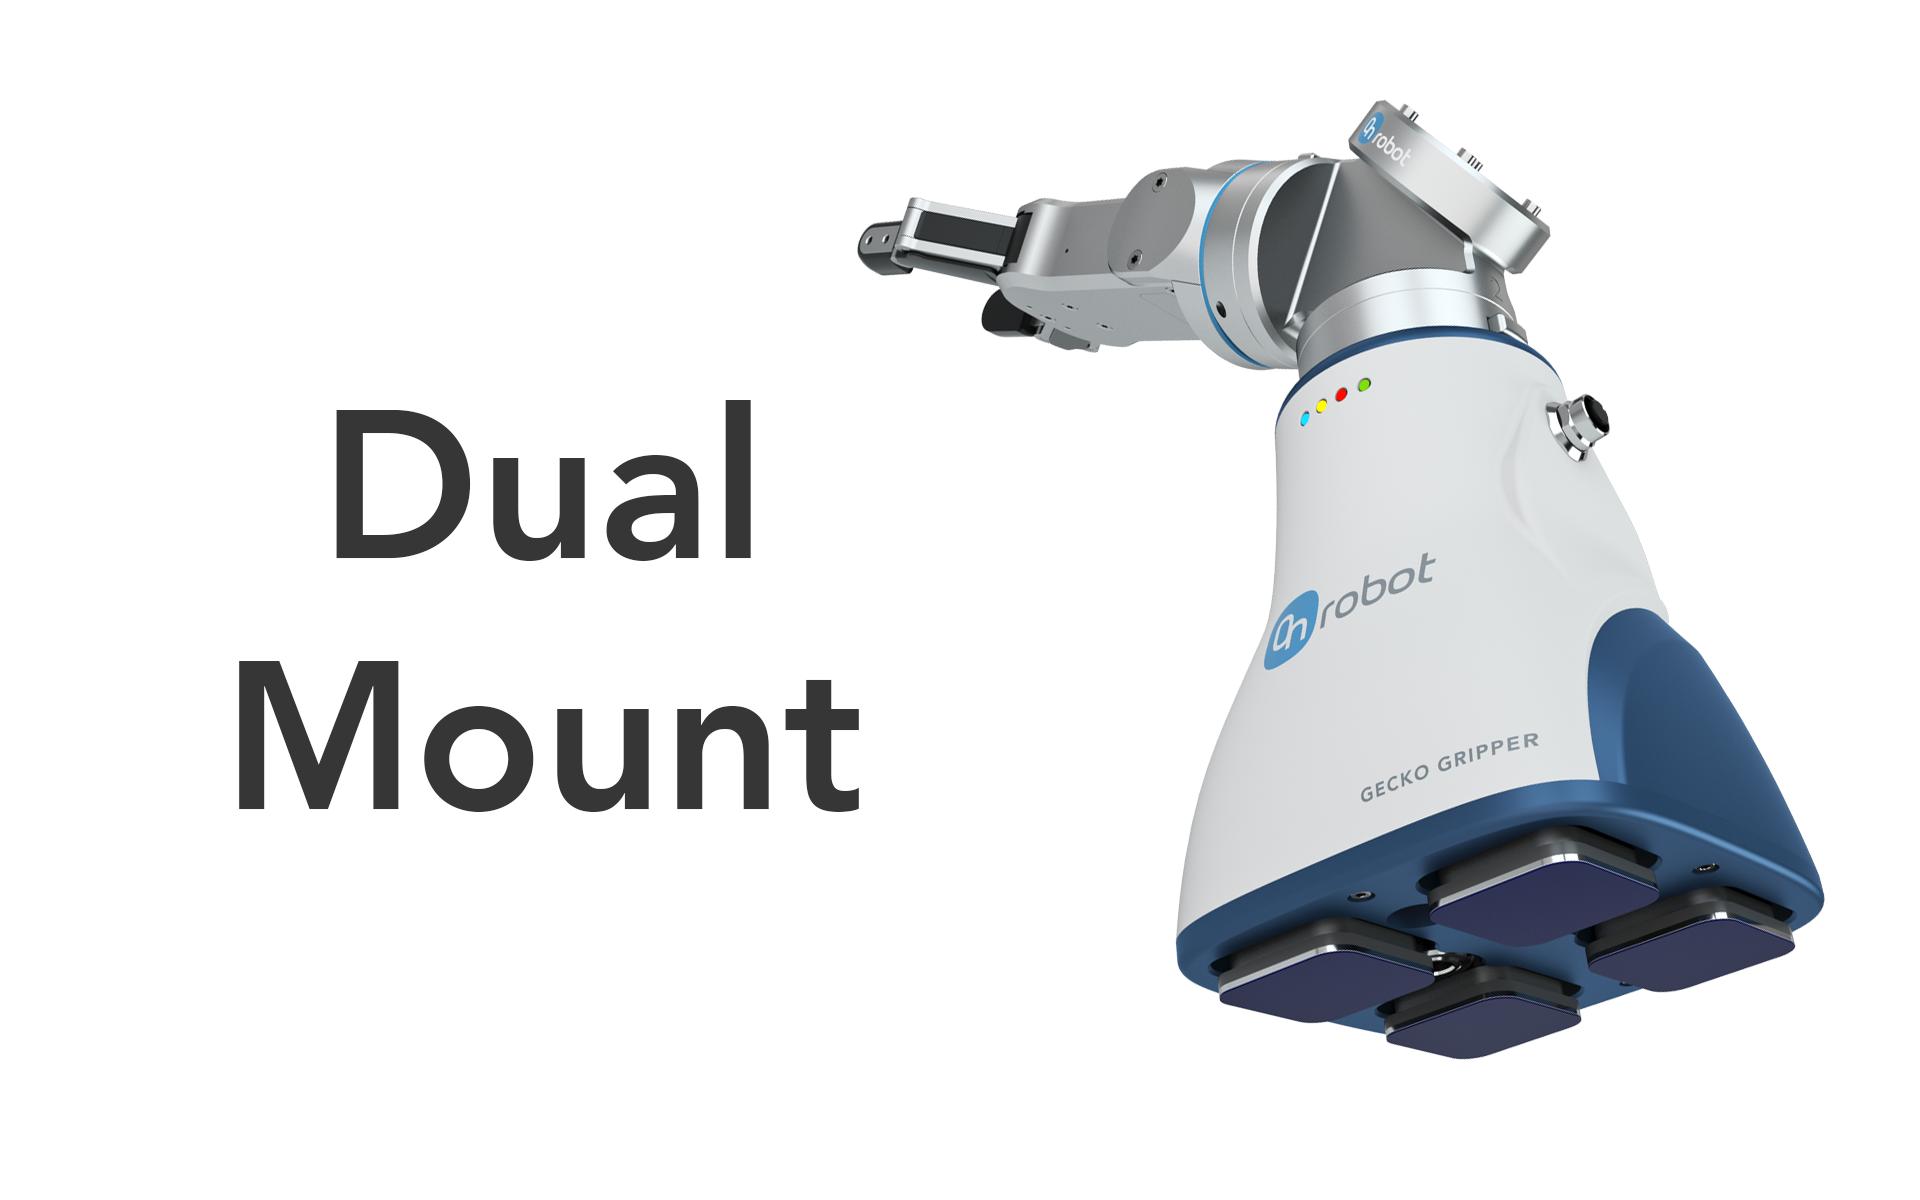 Dual Mount Carousel